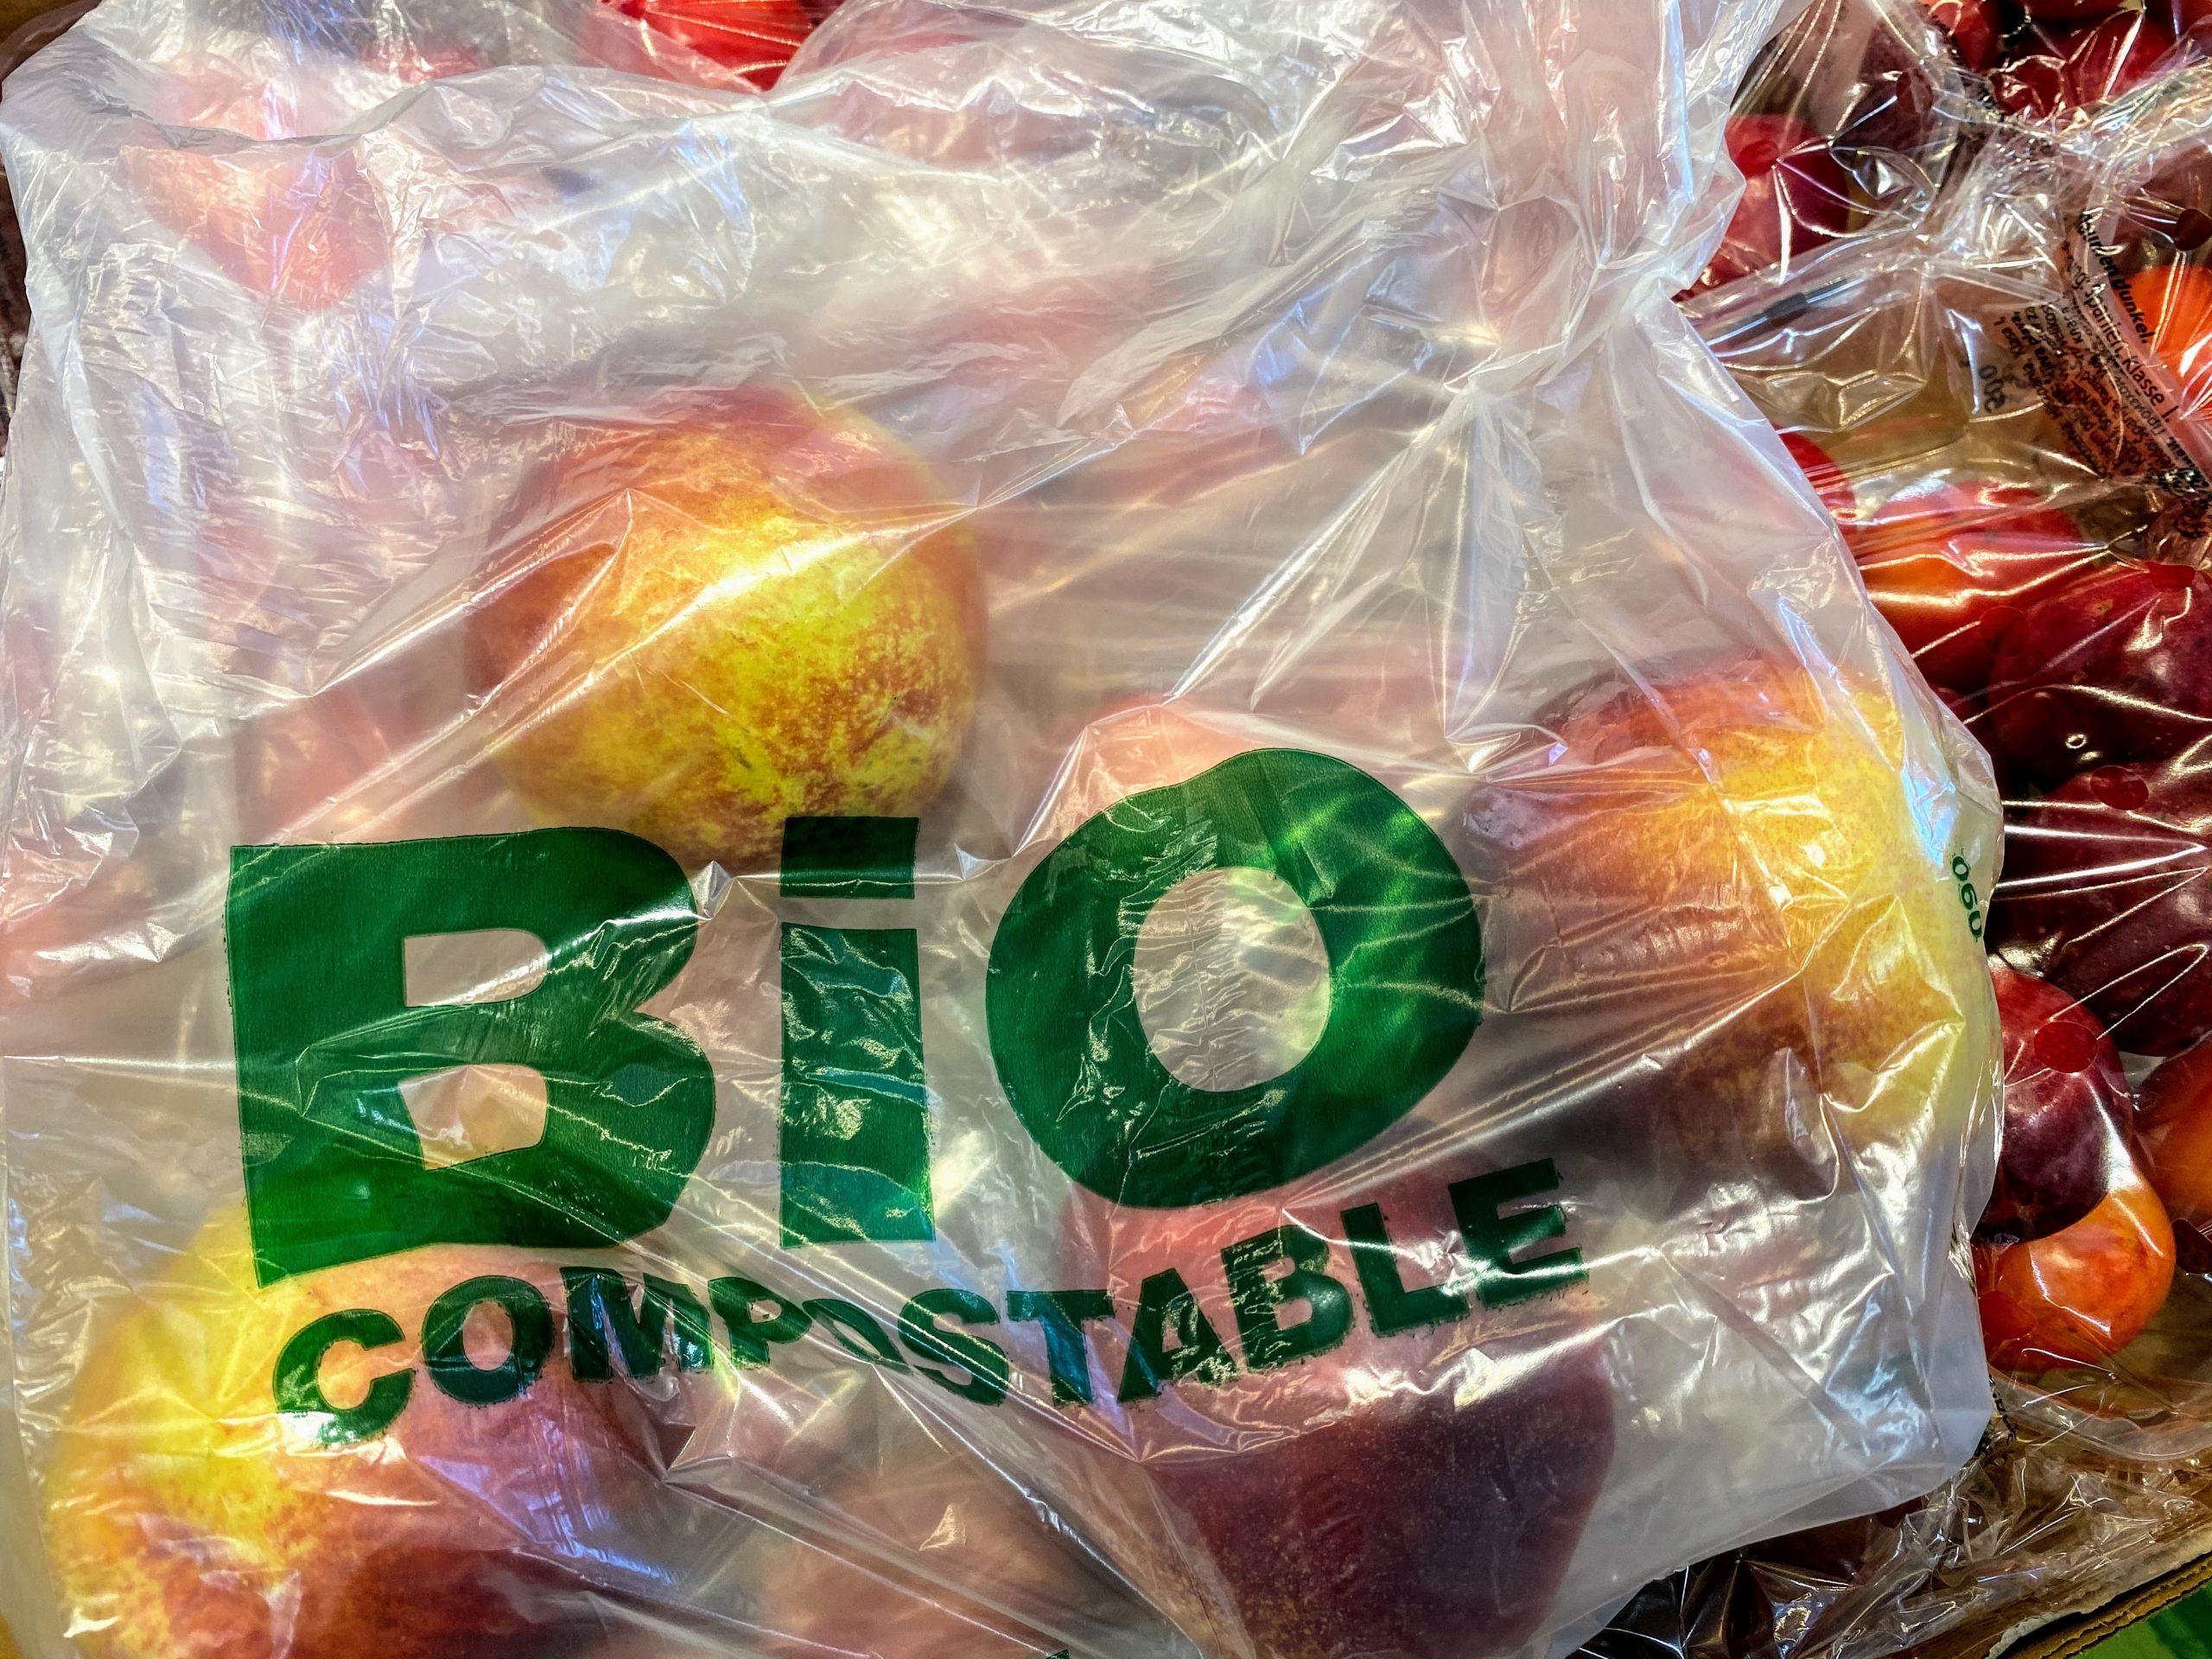 Fruit - Business News Scotland